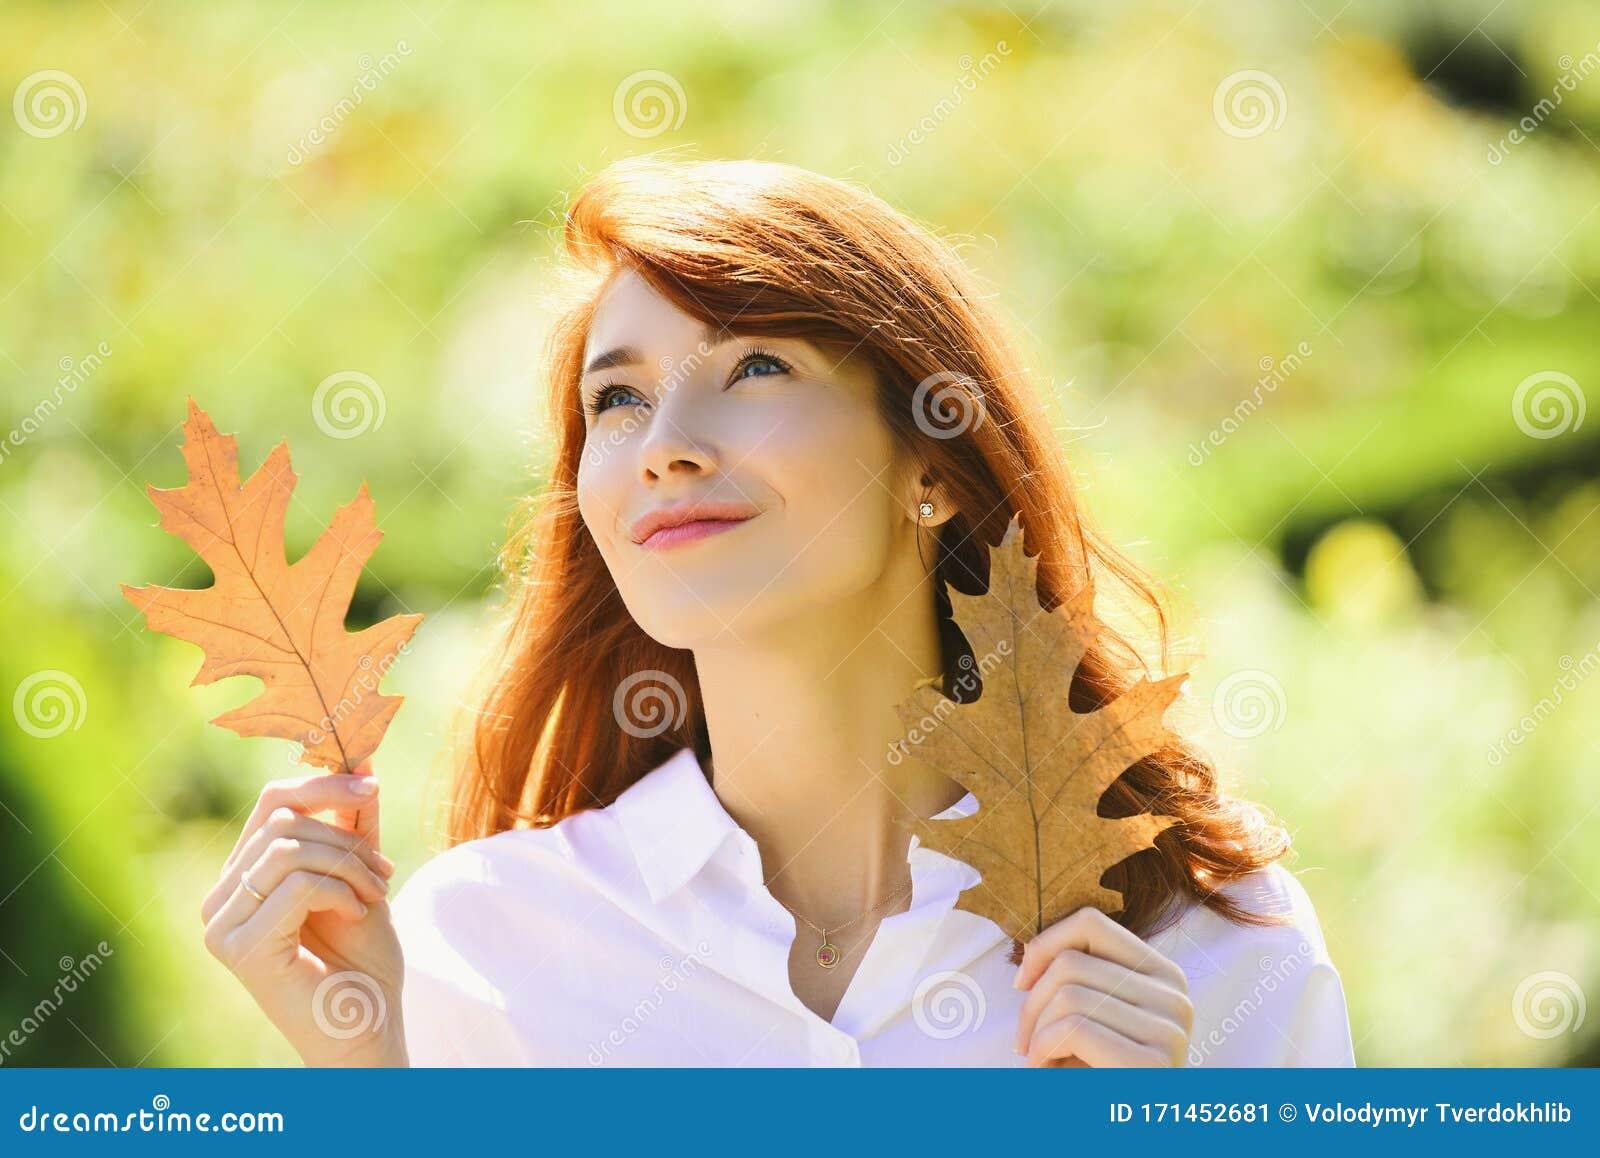 Romantic Looking Cute Girl Walking Outdoor Pretty Woman Playing